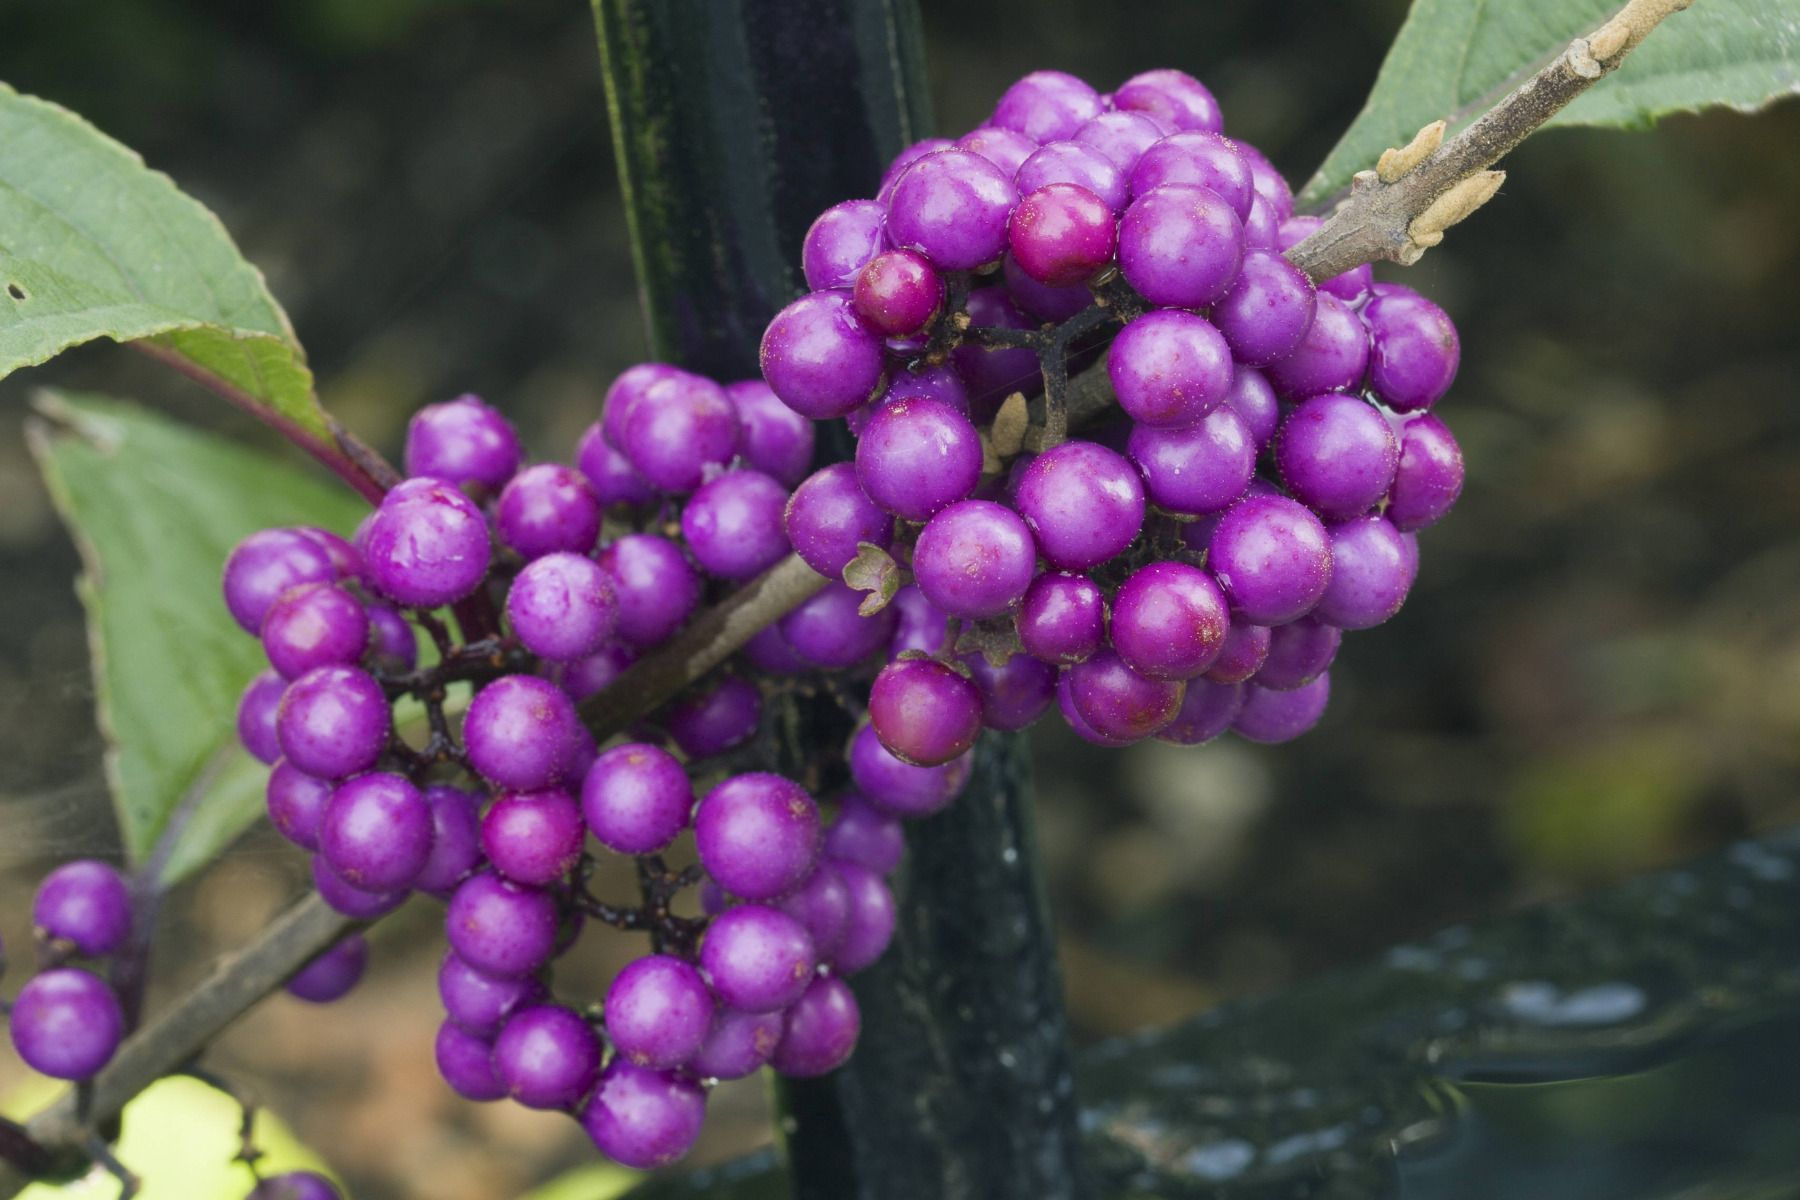 Arbuste Terrain Sec Ombre callicarpa ou arbuste à bonbons